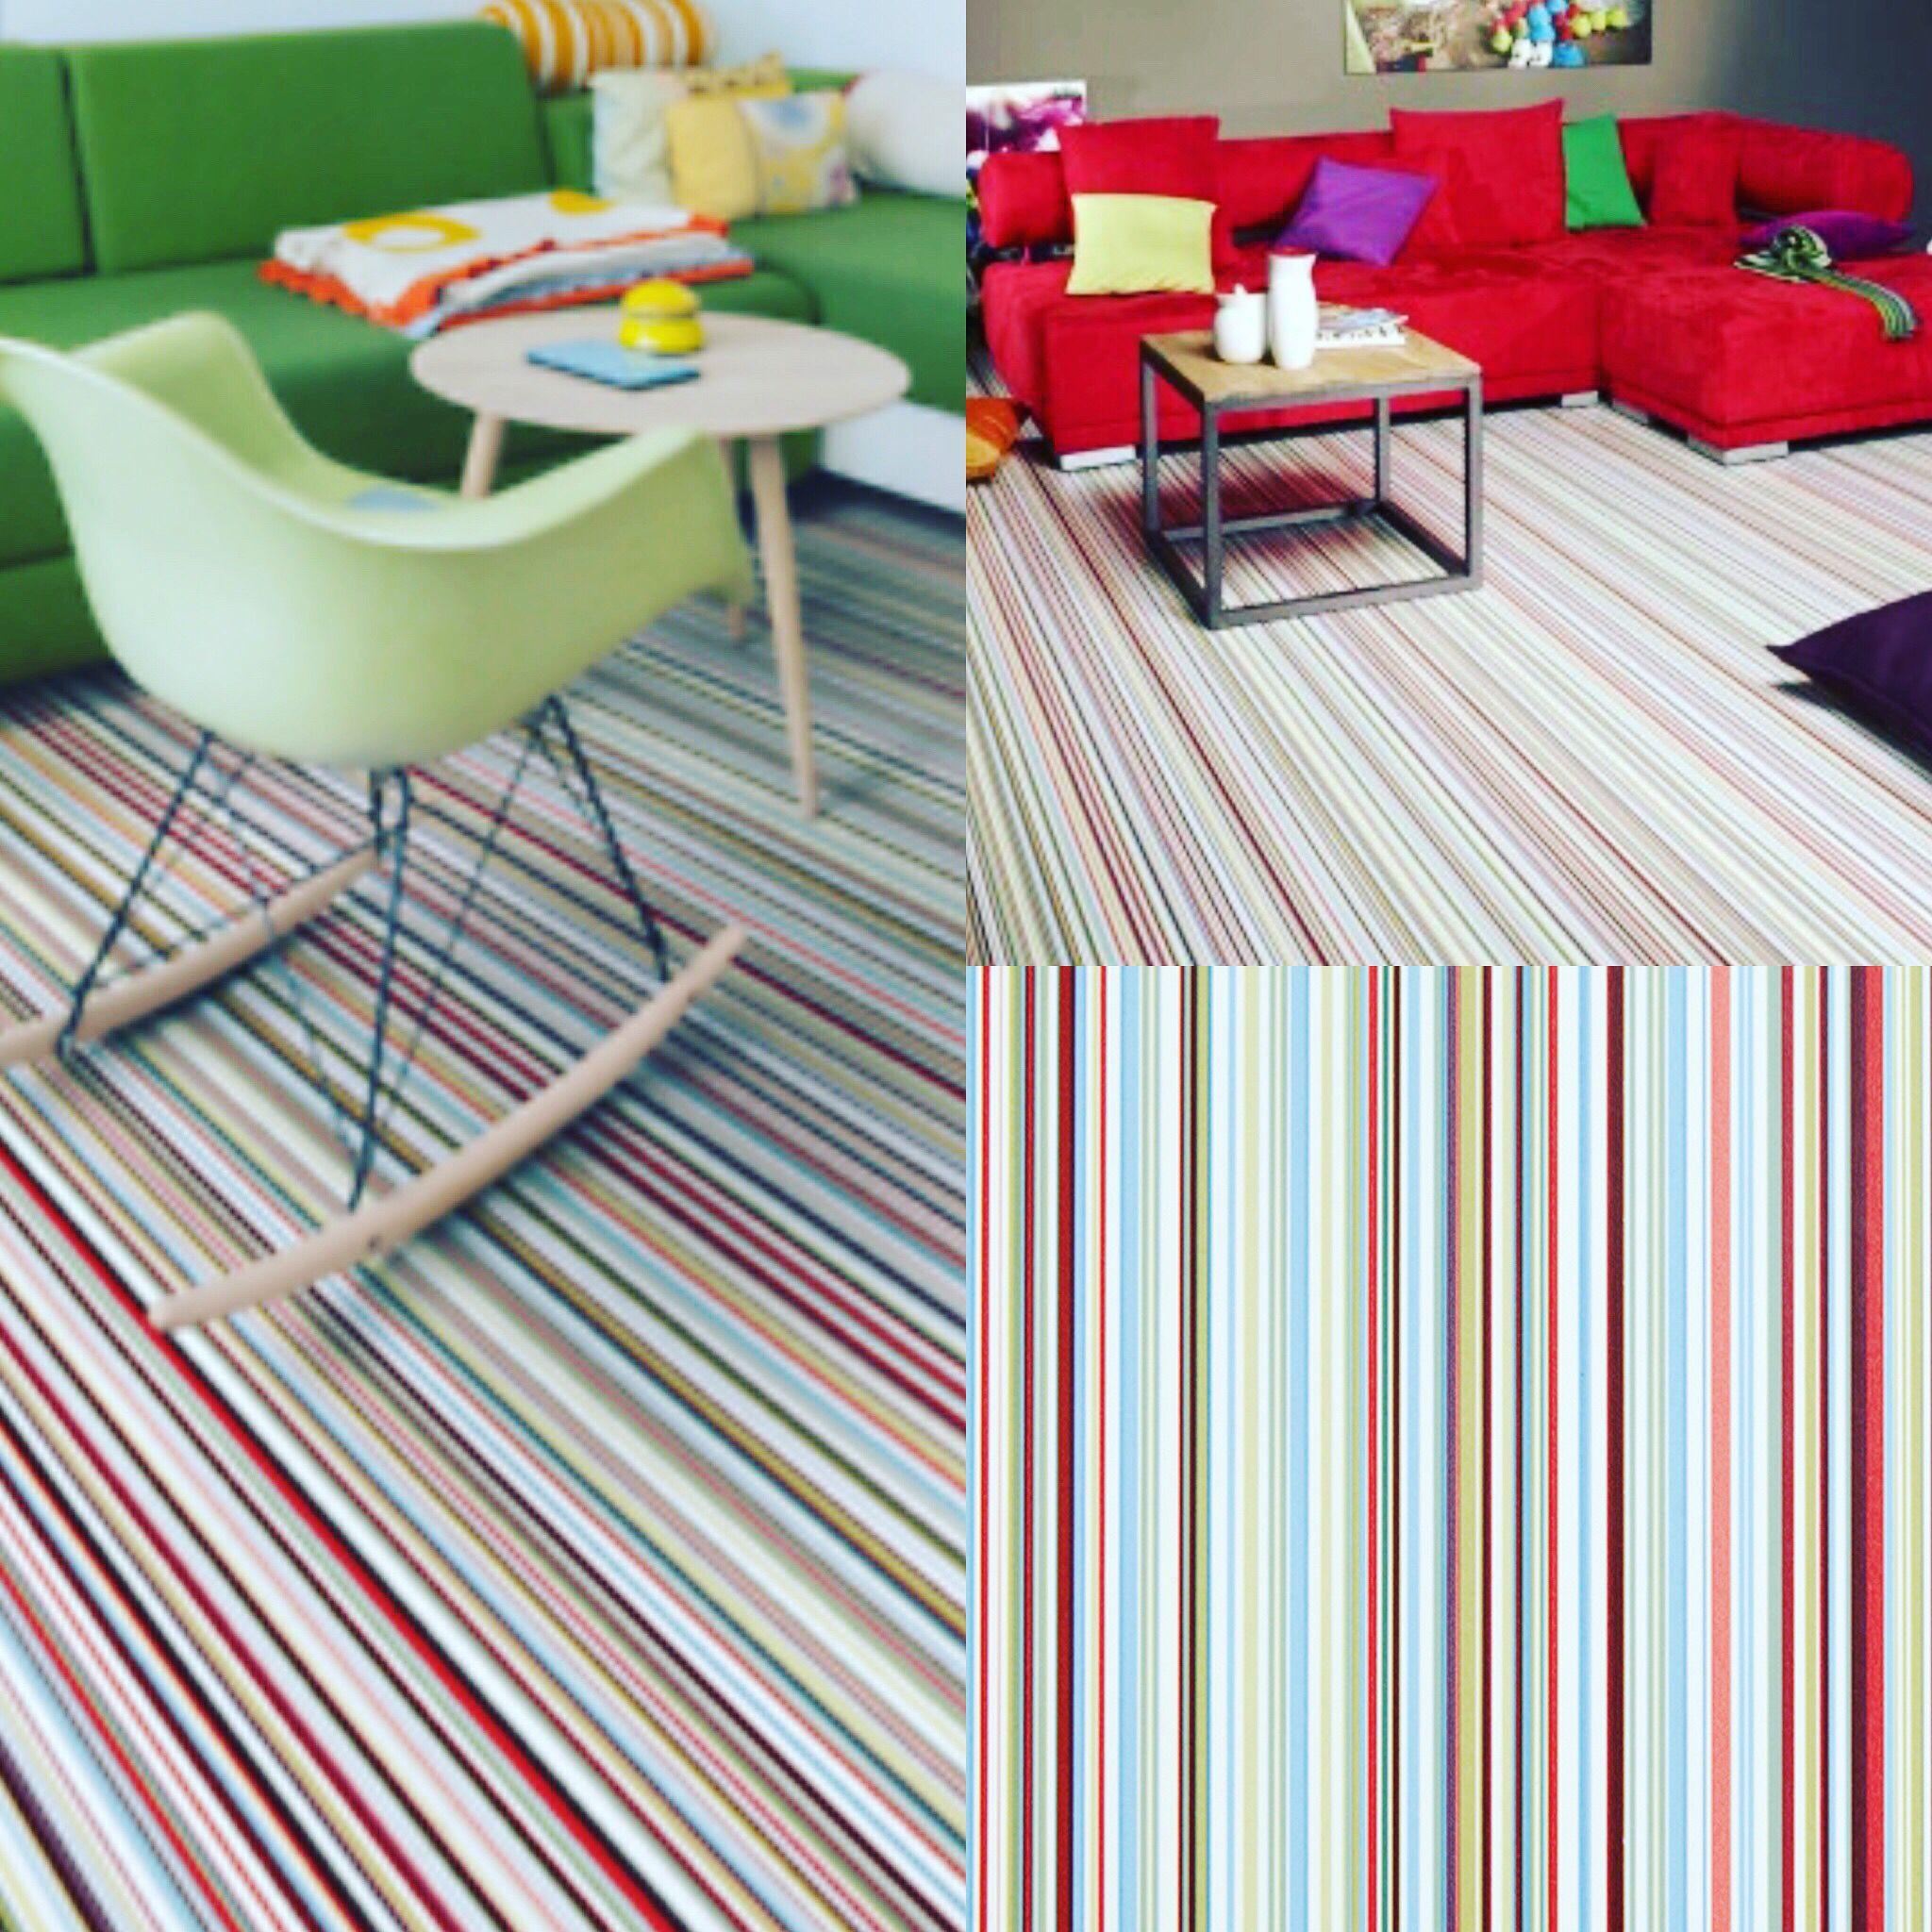 Vinyl in homes 😊 Discount carpet, Carpet tiles cheap